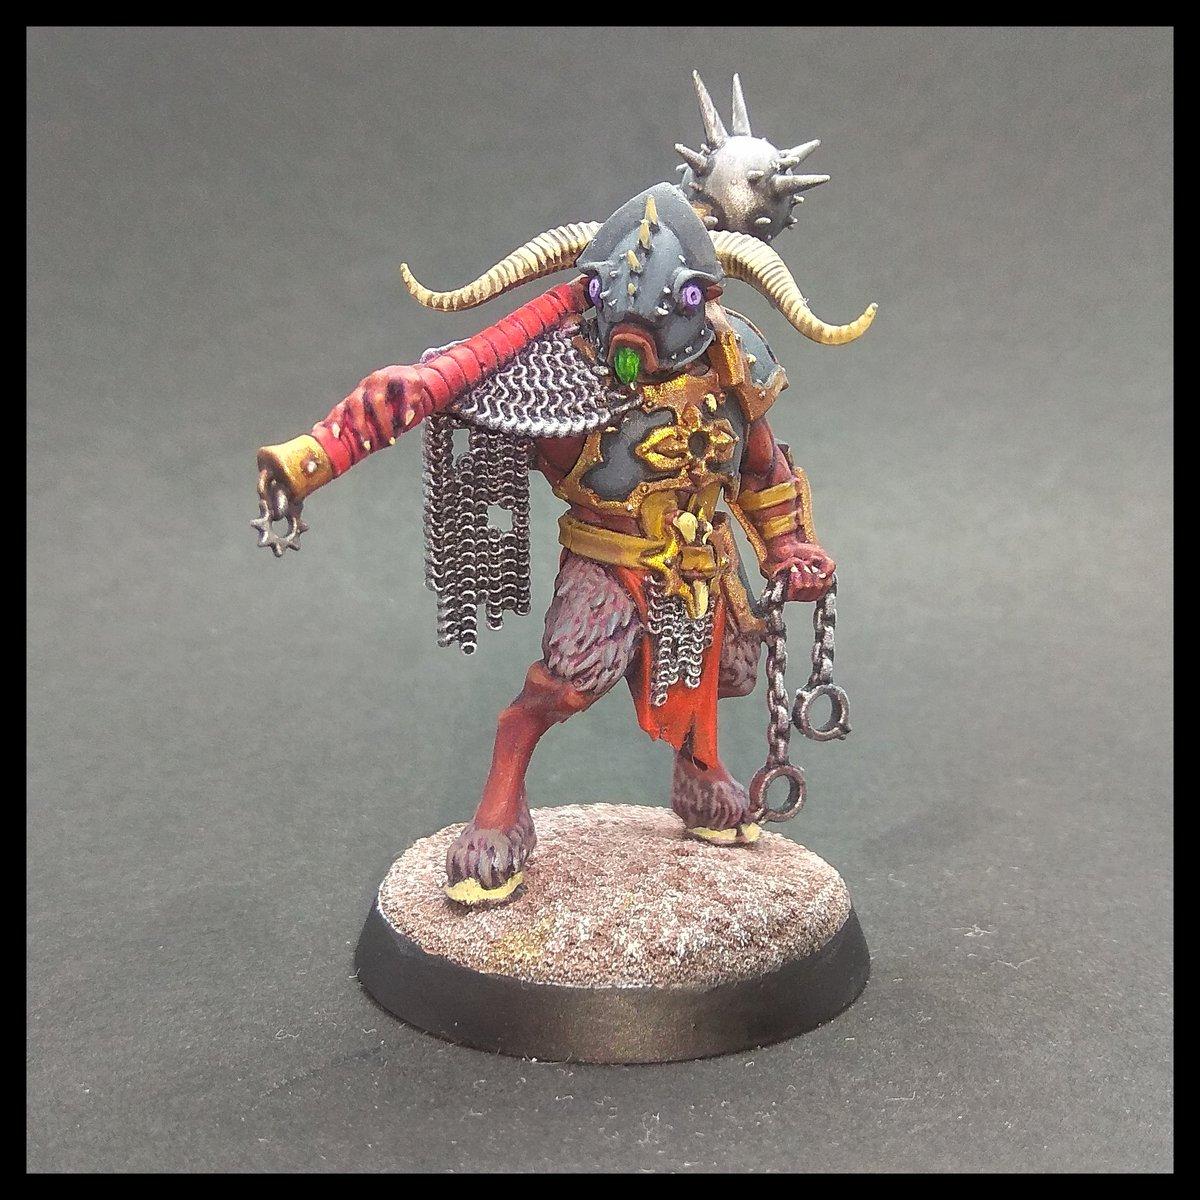 Octava miniatura de la banda de Spire Tyants, el Bestigor destructor.  Warcry: Bestigor Destroyer.  #paintingwarhammer #miniatures #ageofsigmar #warcry https://t.co/M3ZVJpuBeX